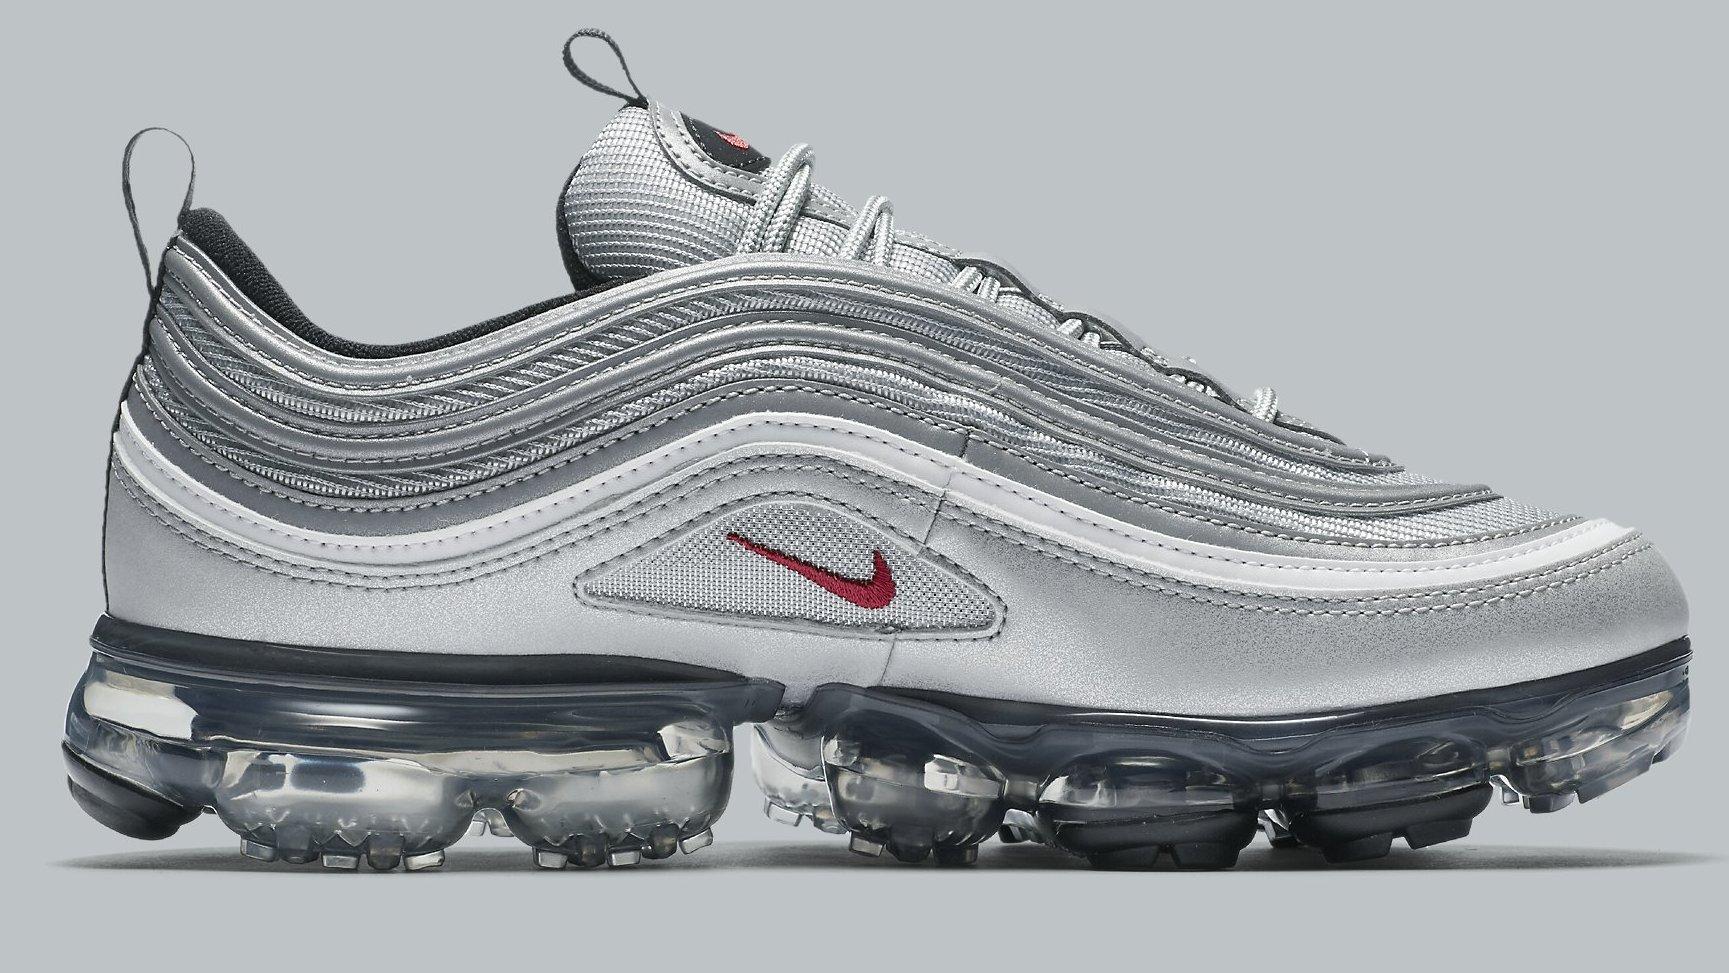 Nike Air Vapormax '97 - Metallic Silver/Varsity Red great deals online Hs4ktk